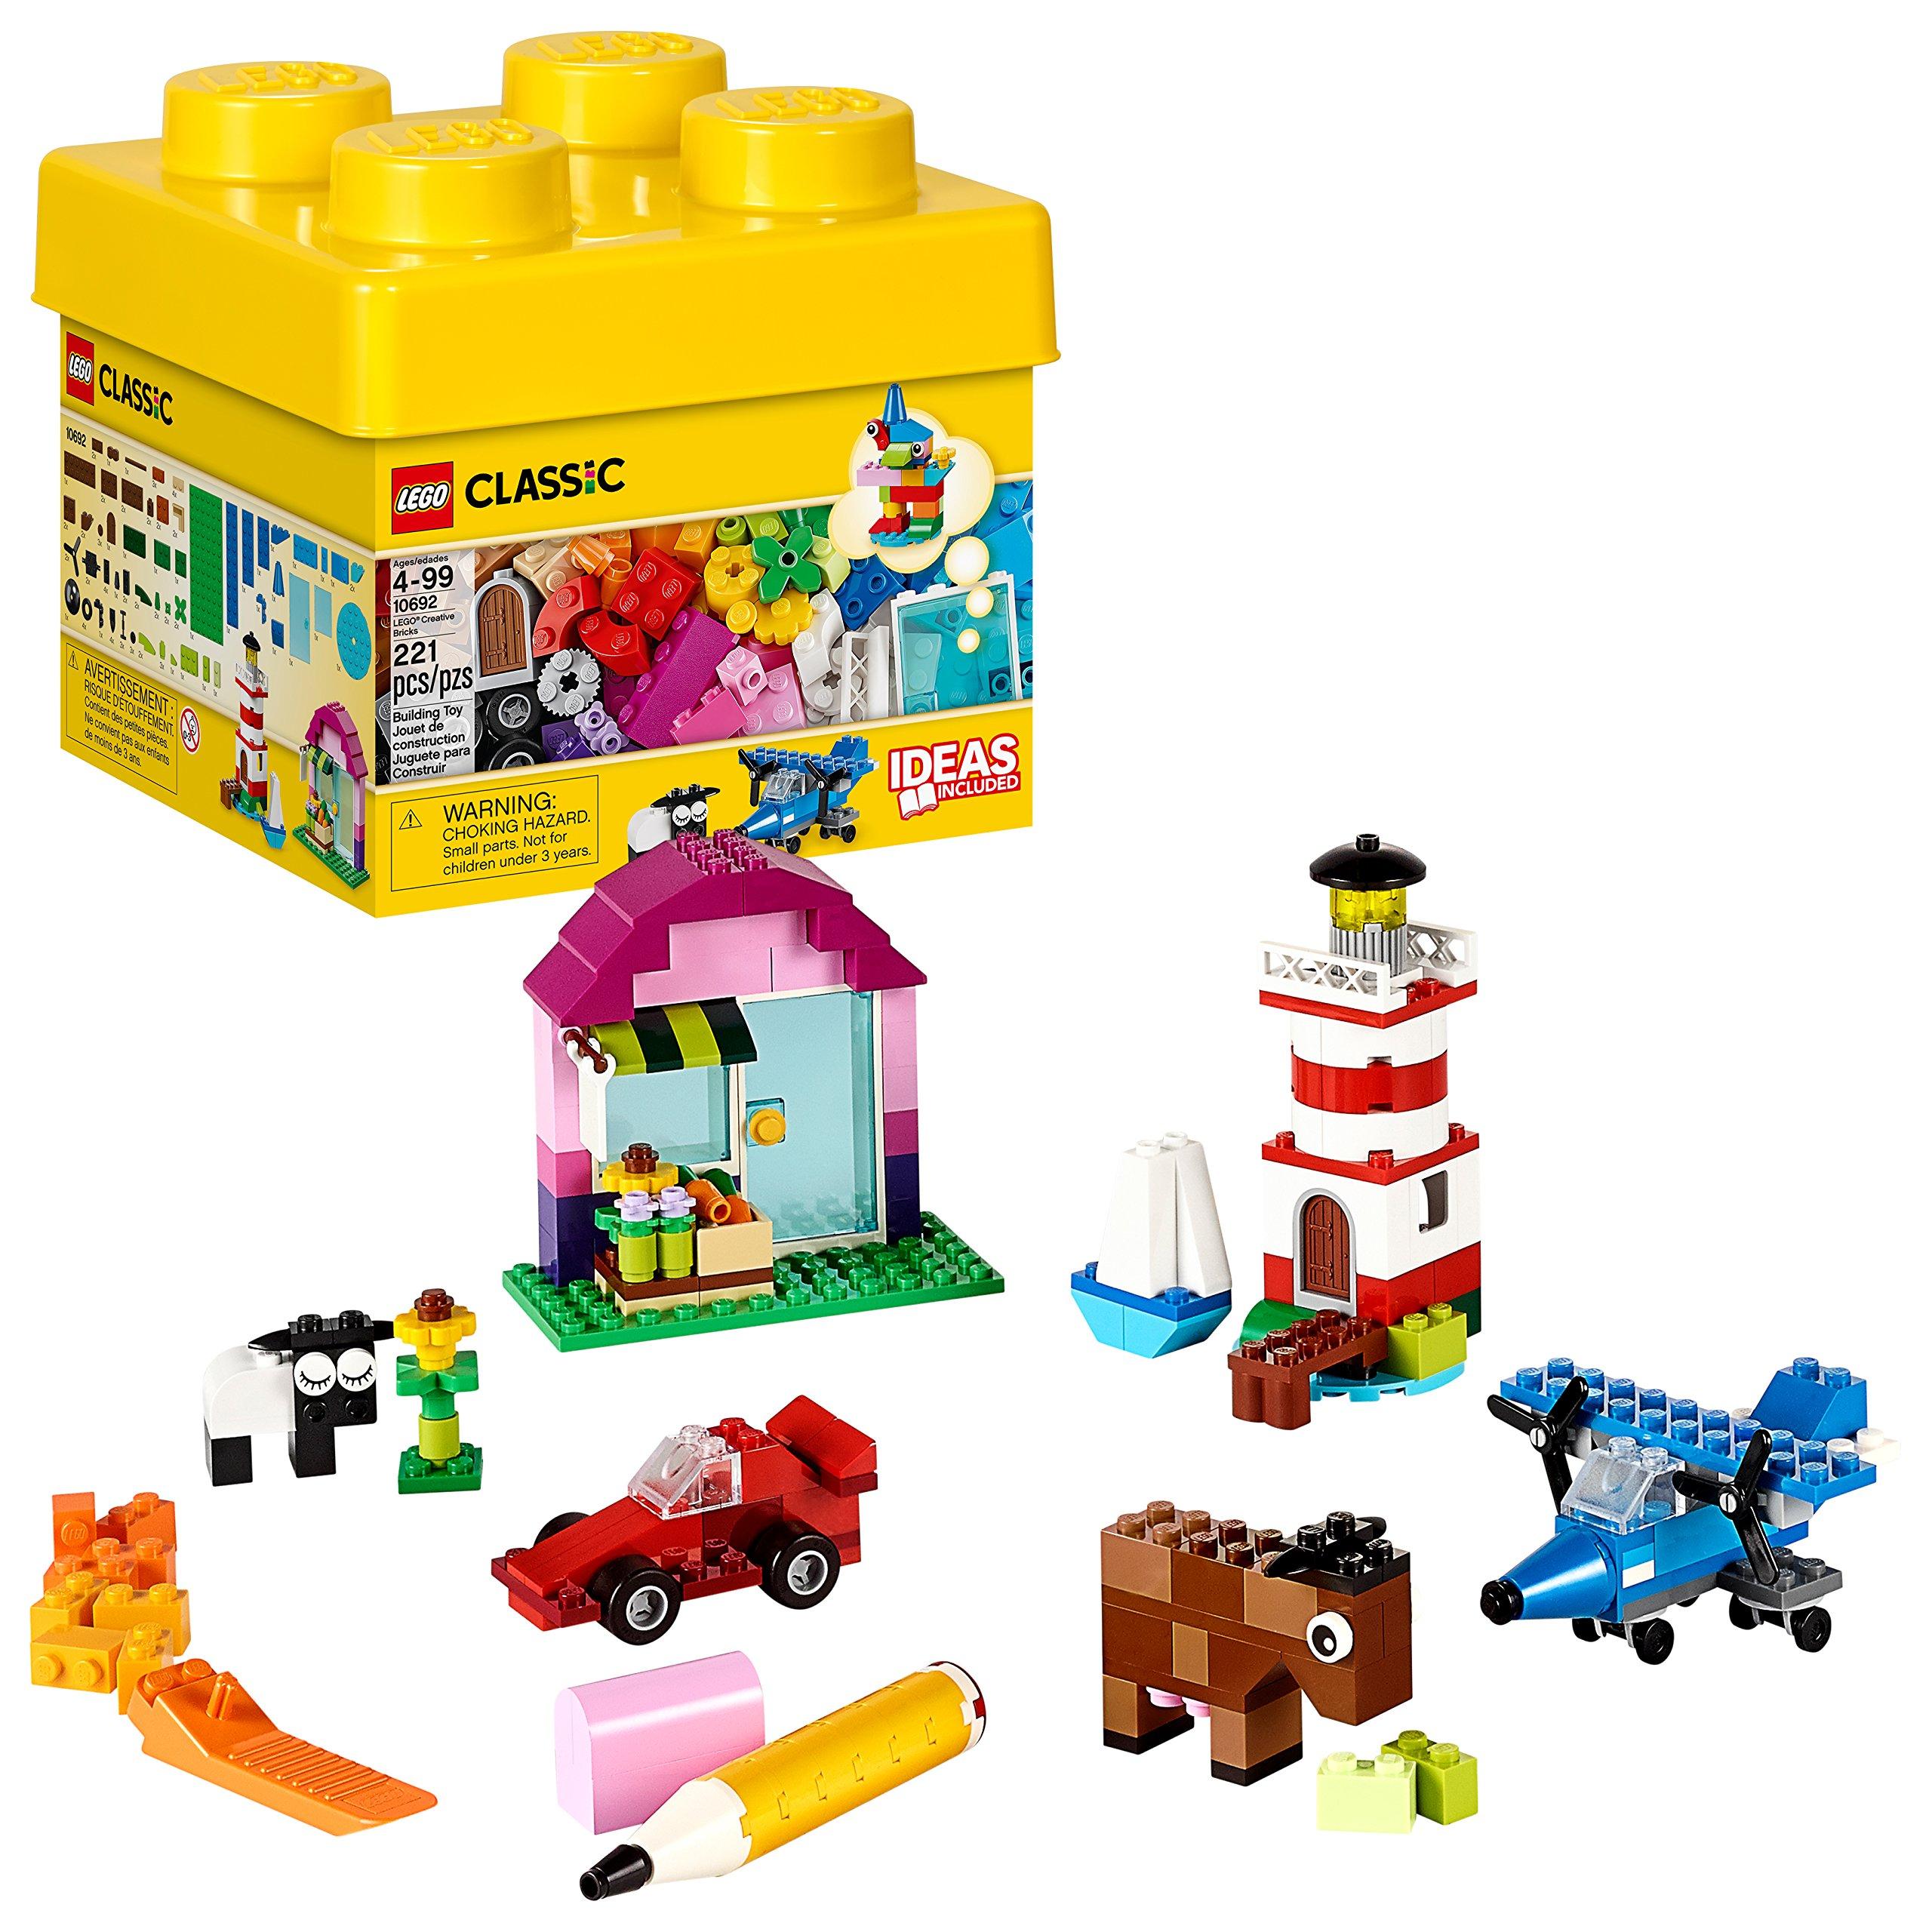 LEGO Classic Creative Bricks 10692 Building Blocks, Learning Toy